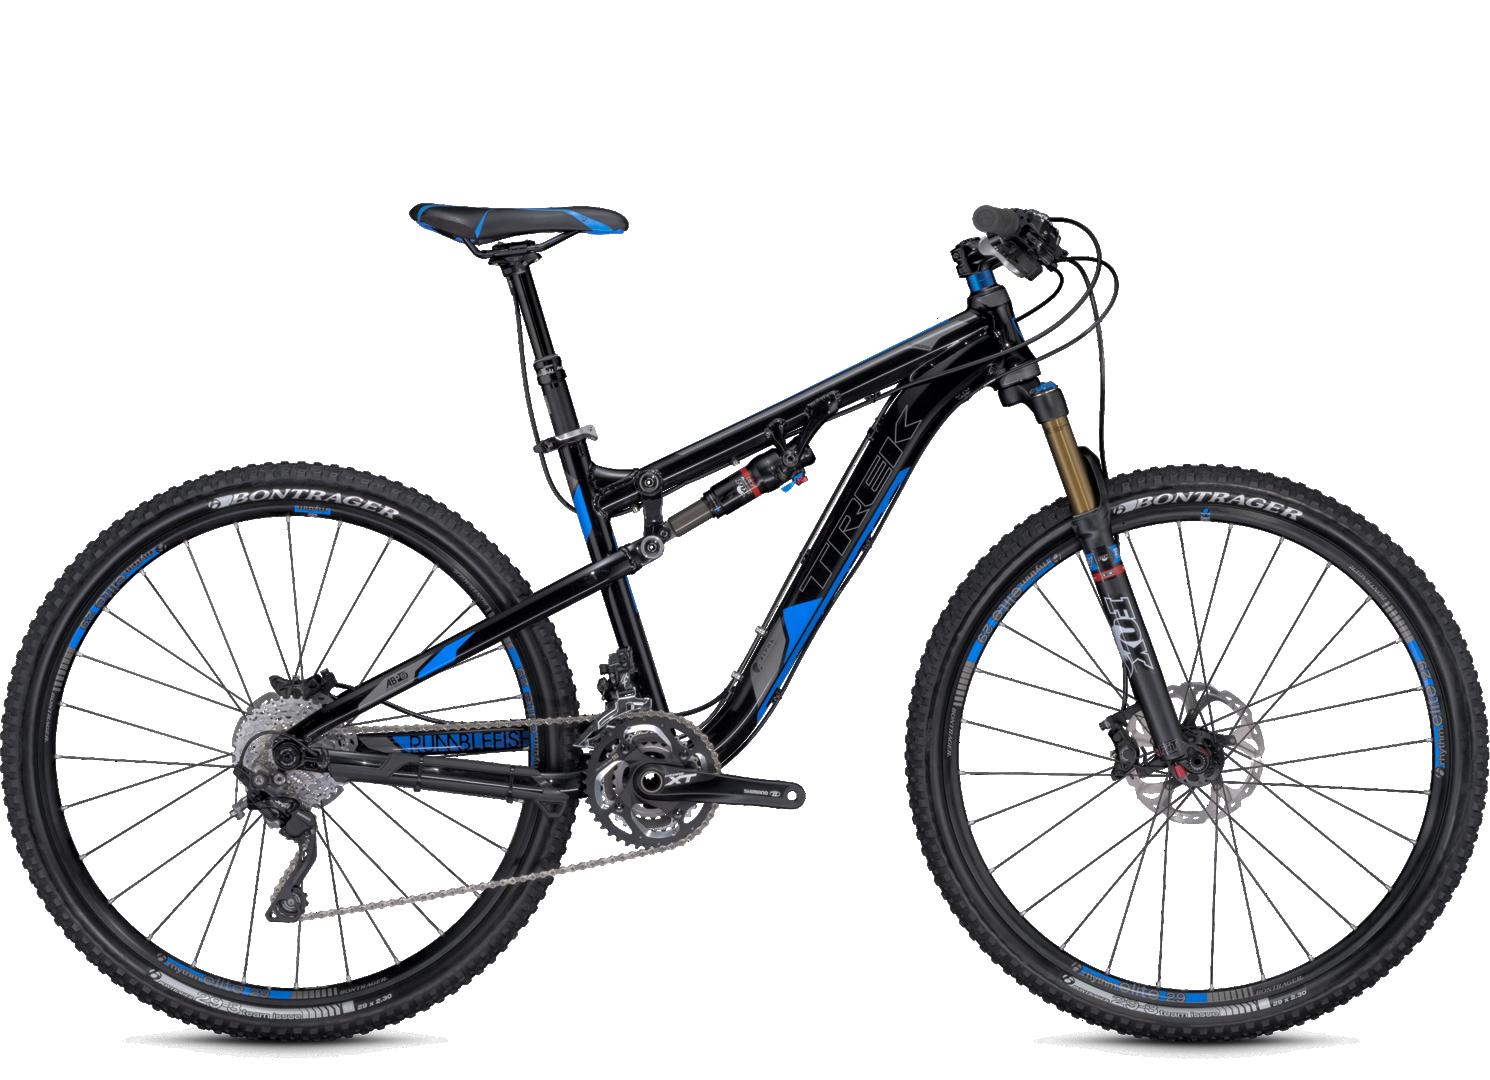 Bicycle Tune Up >> 2013 Rumblefish Pro - Bike Archive - Trek Bicycle